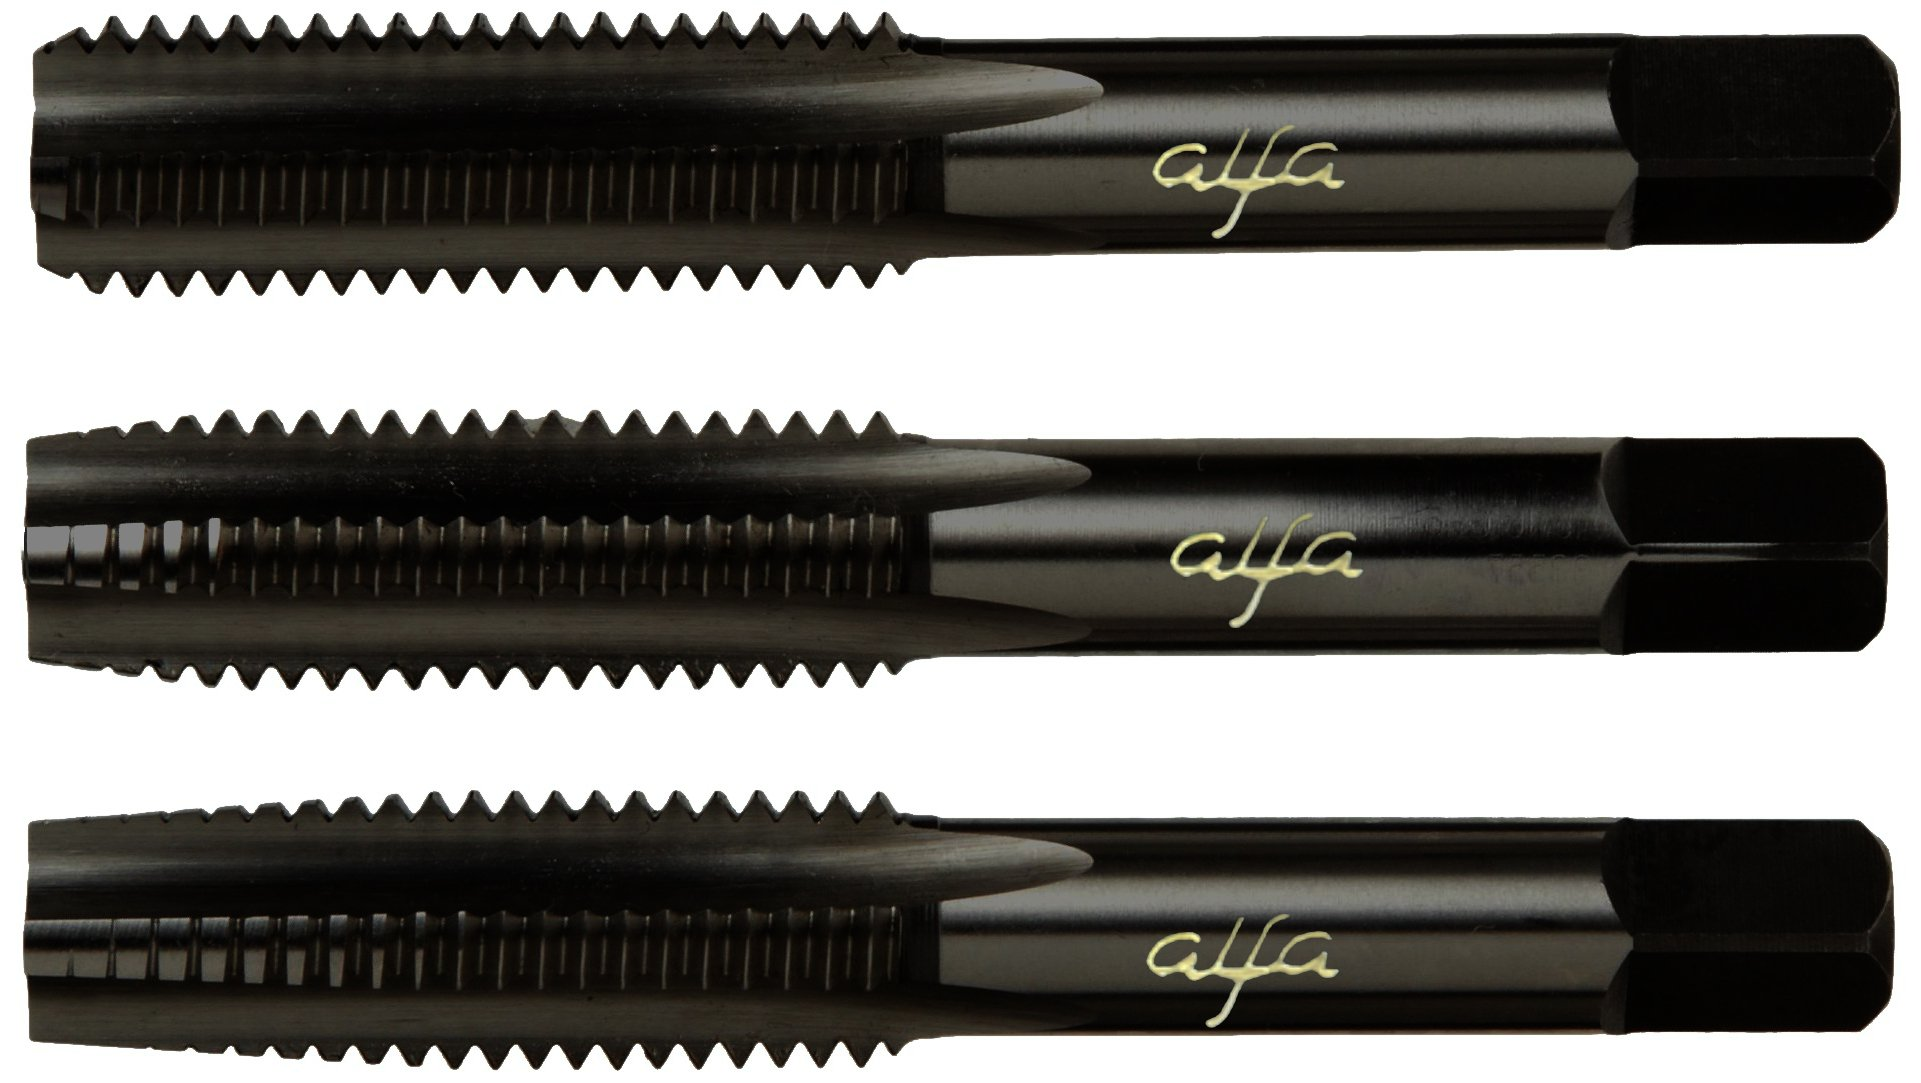 Alfa Tools HTS80034 3/8-16 Hss Black Oxide Alfa Hand Tap Set Made In USA, by Alfa Tools